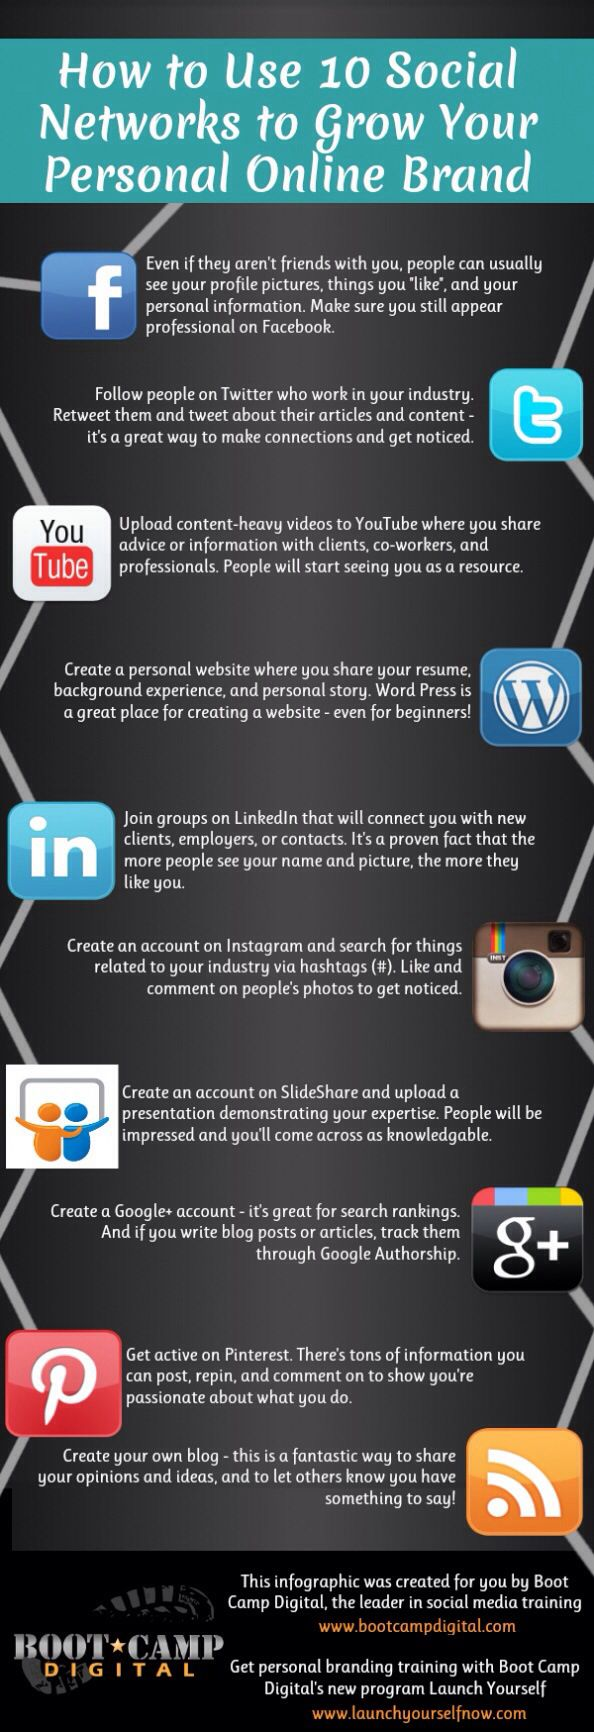 Strategies for using social media to grow your personal brand. #marketing #socialmedia FREE Marketing Training http://simplicitymarketingllc.com/bizcamp  Instagram for Yorkshire Businesses